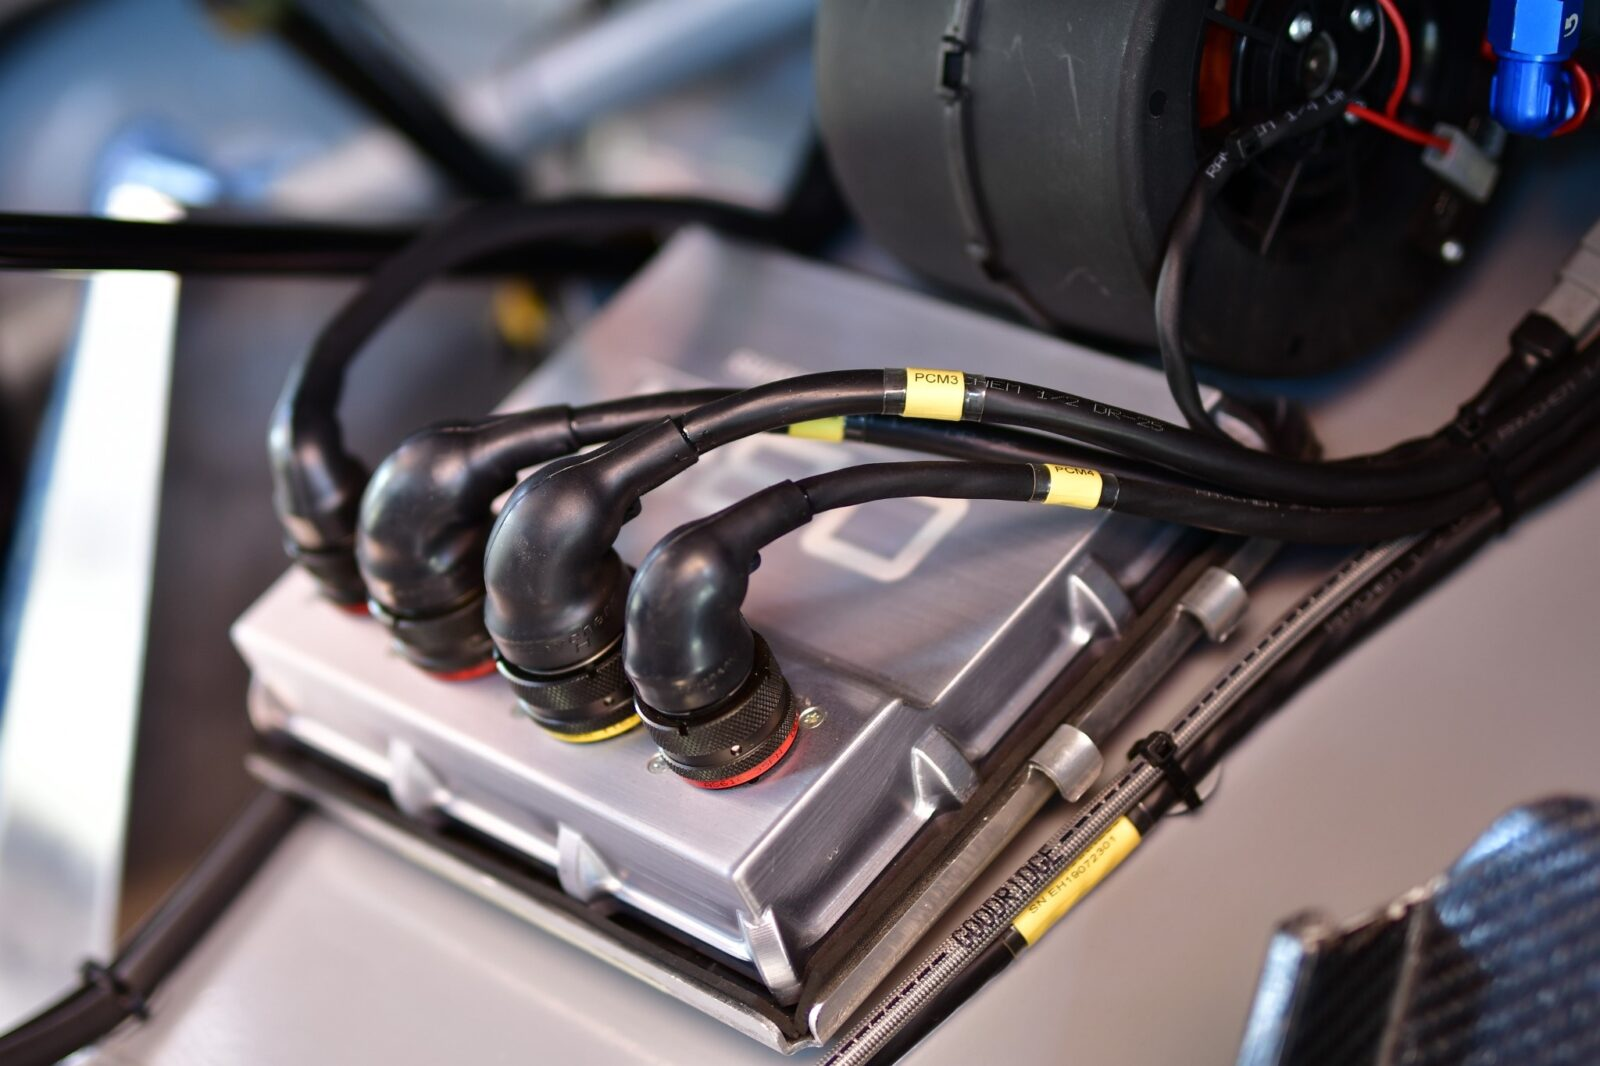 OBR powerbox PCM2, PDM, PCM, FIA R4 motorpsort electronics supplied by Longman Racing